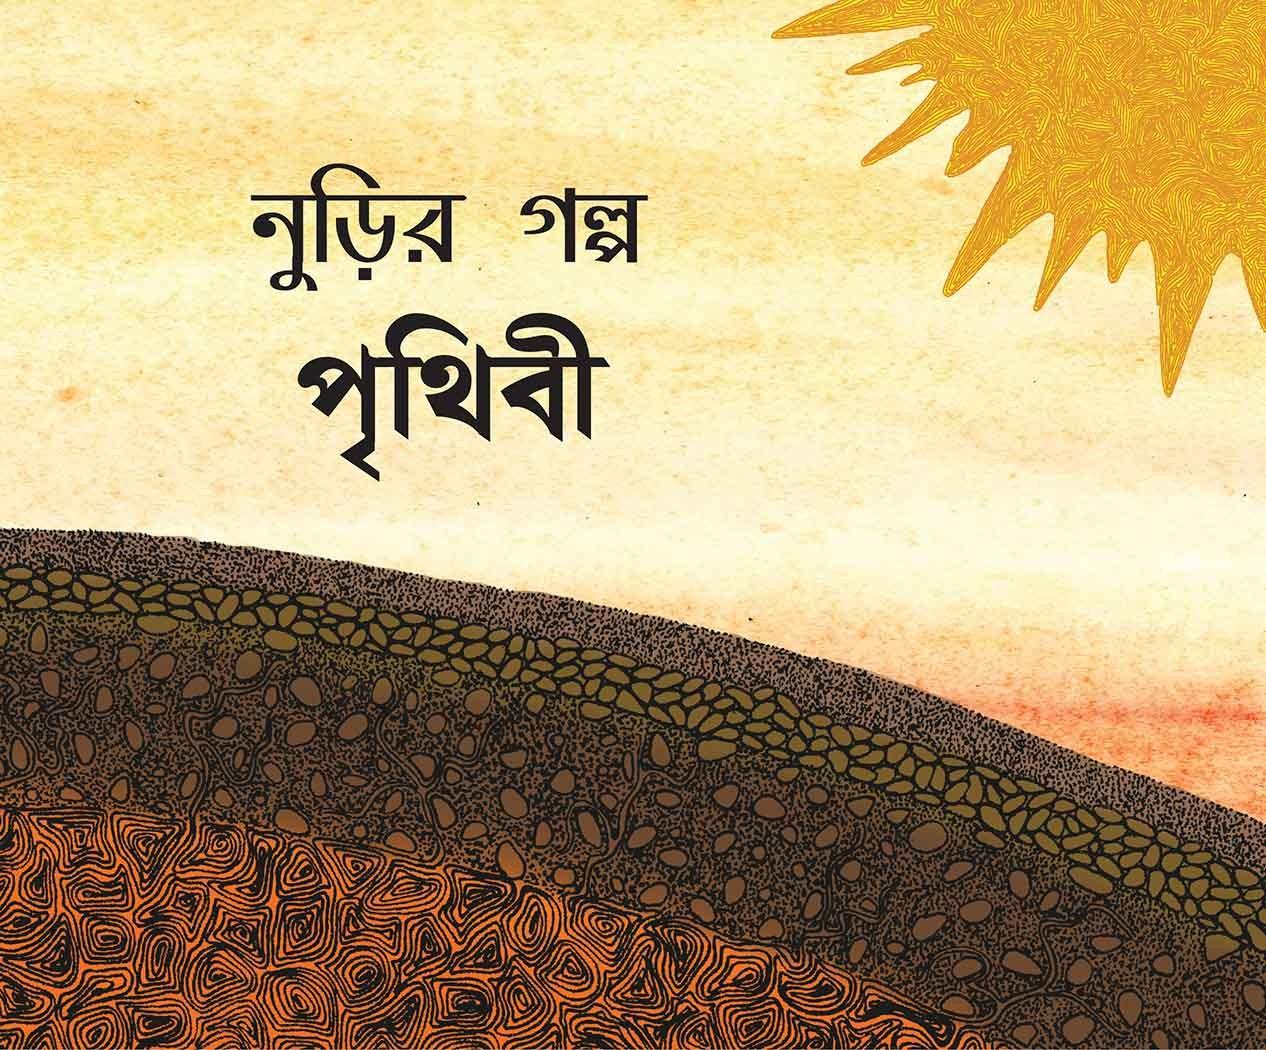 Gitti's Story-Earth/Noorir Golpo-Prithibi (Bengali)